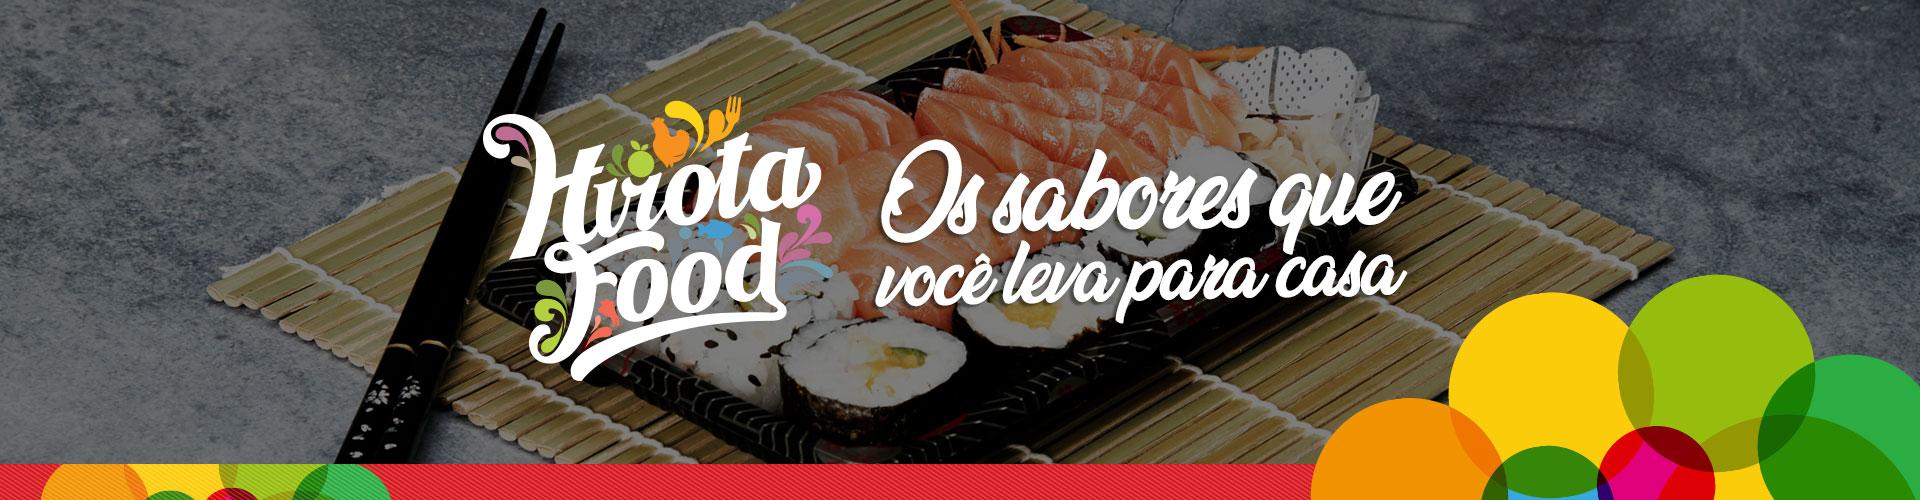 banner-food-1 Hirota Food